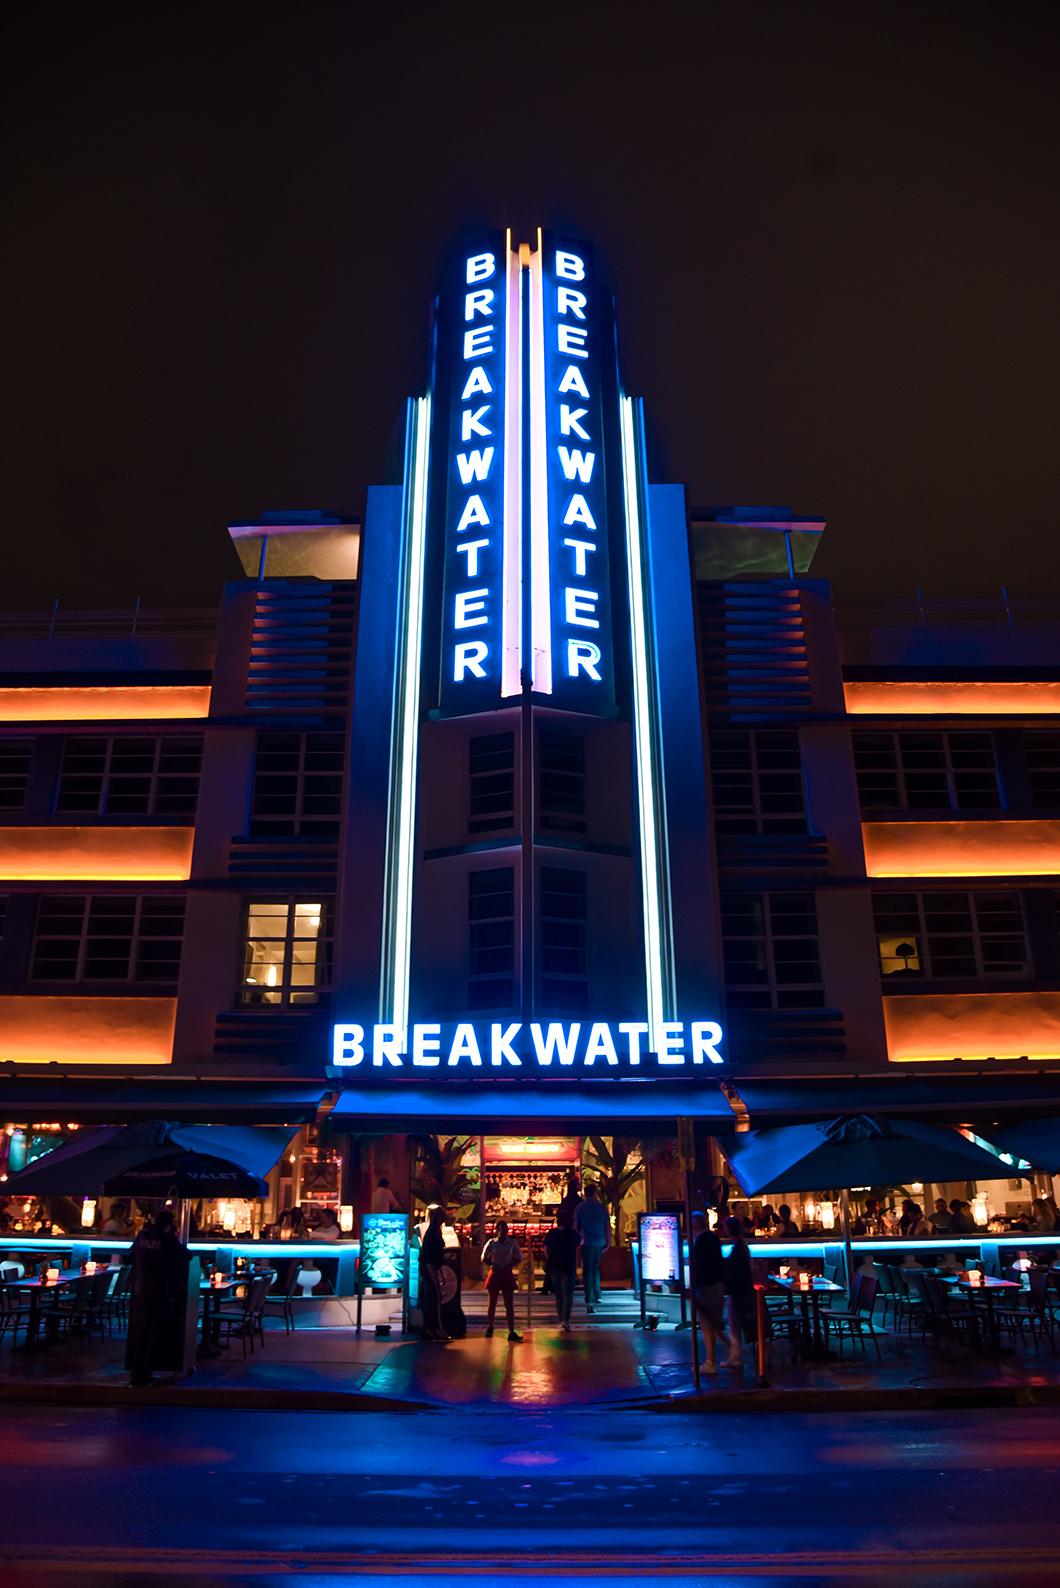 Hotel art deco de Miami de nuit